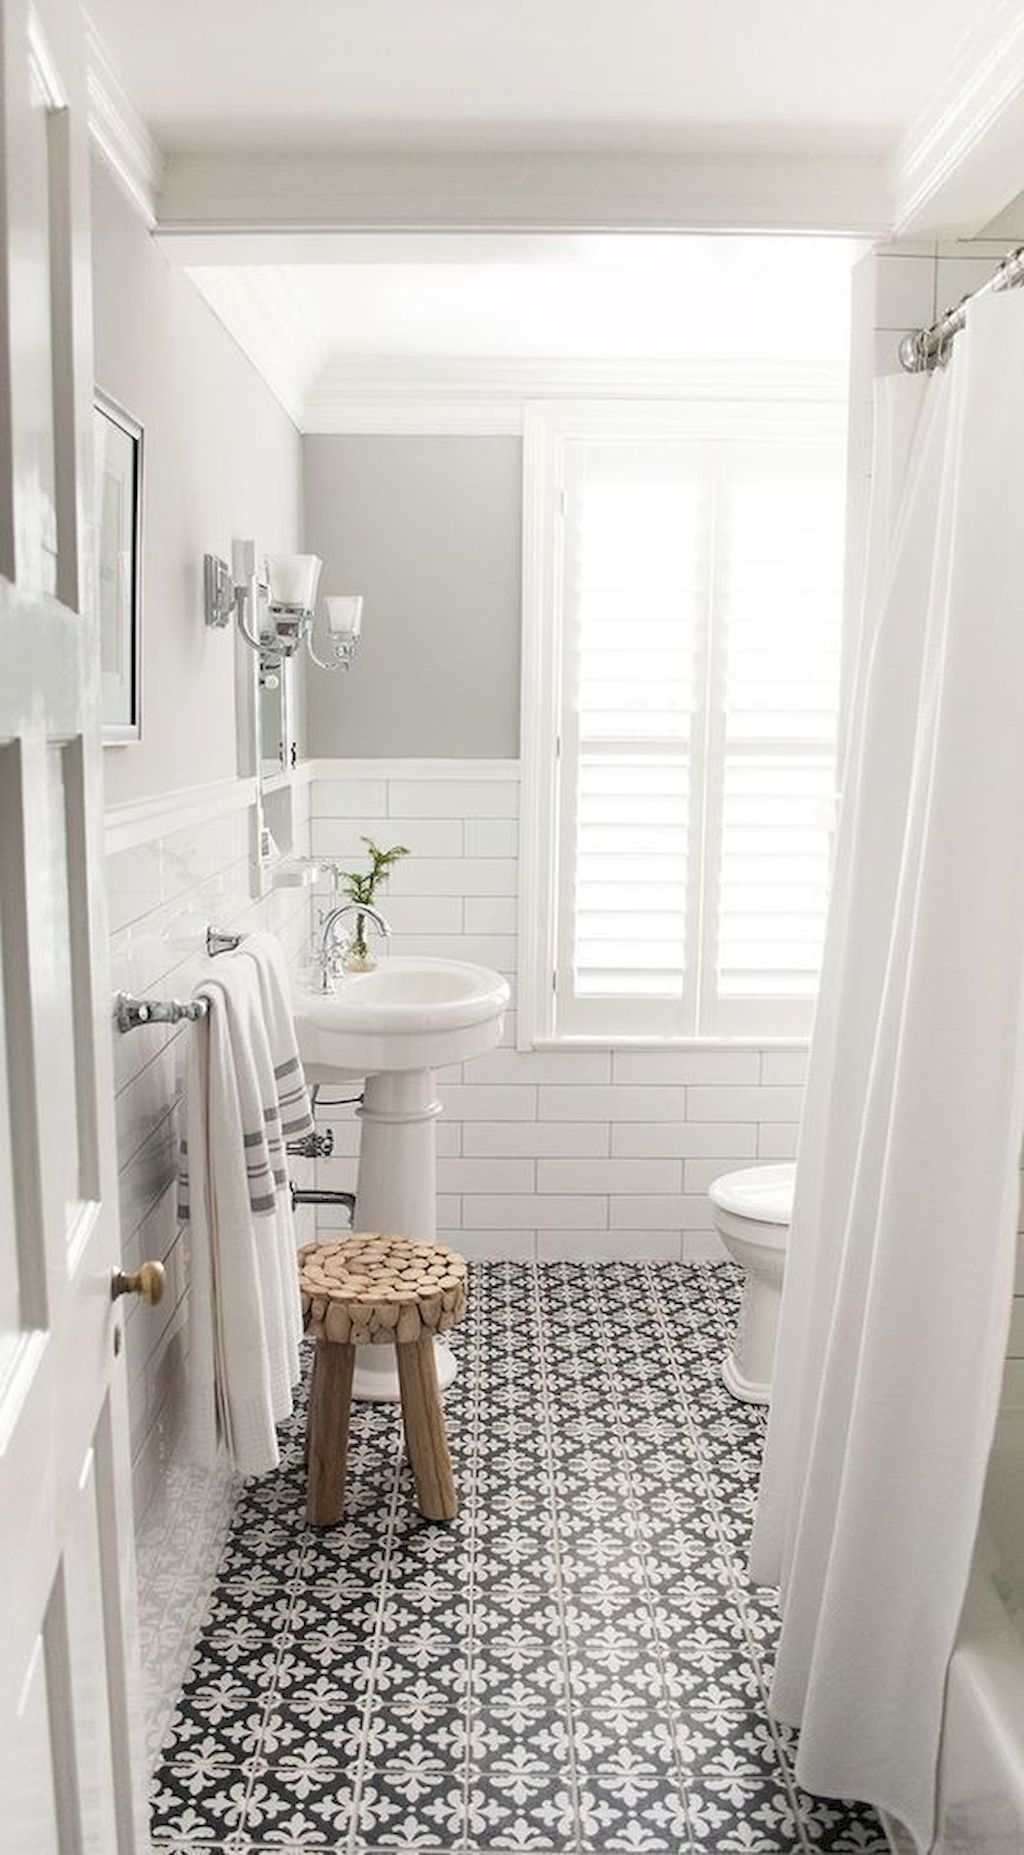 80 Modern Black and White Bathroom Decoration Ideashttps ...